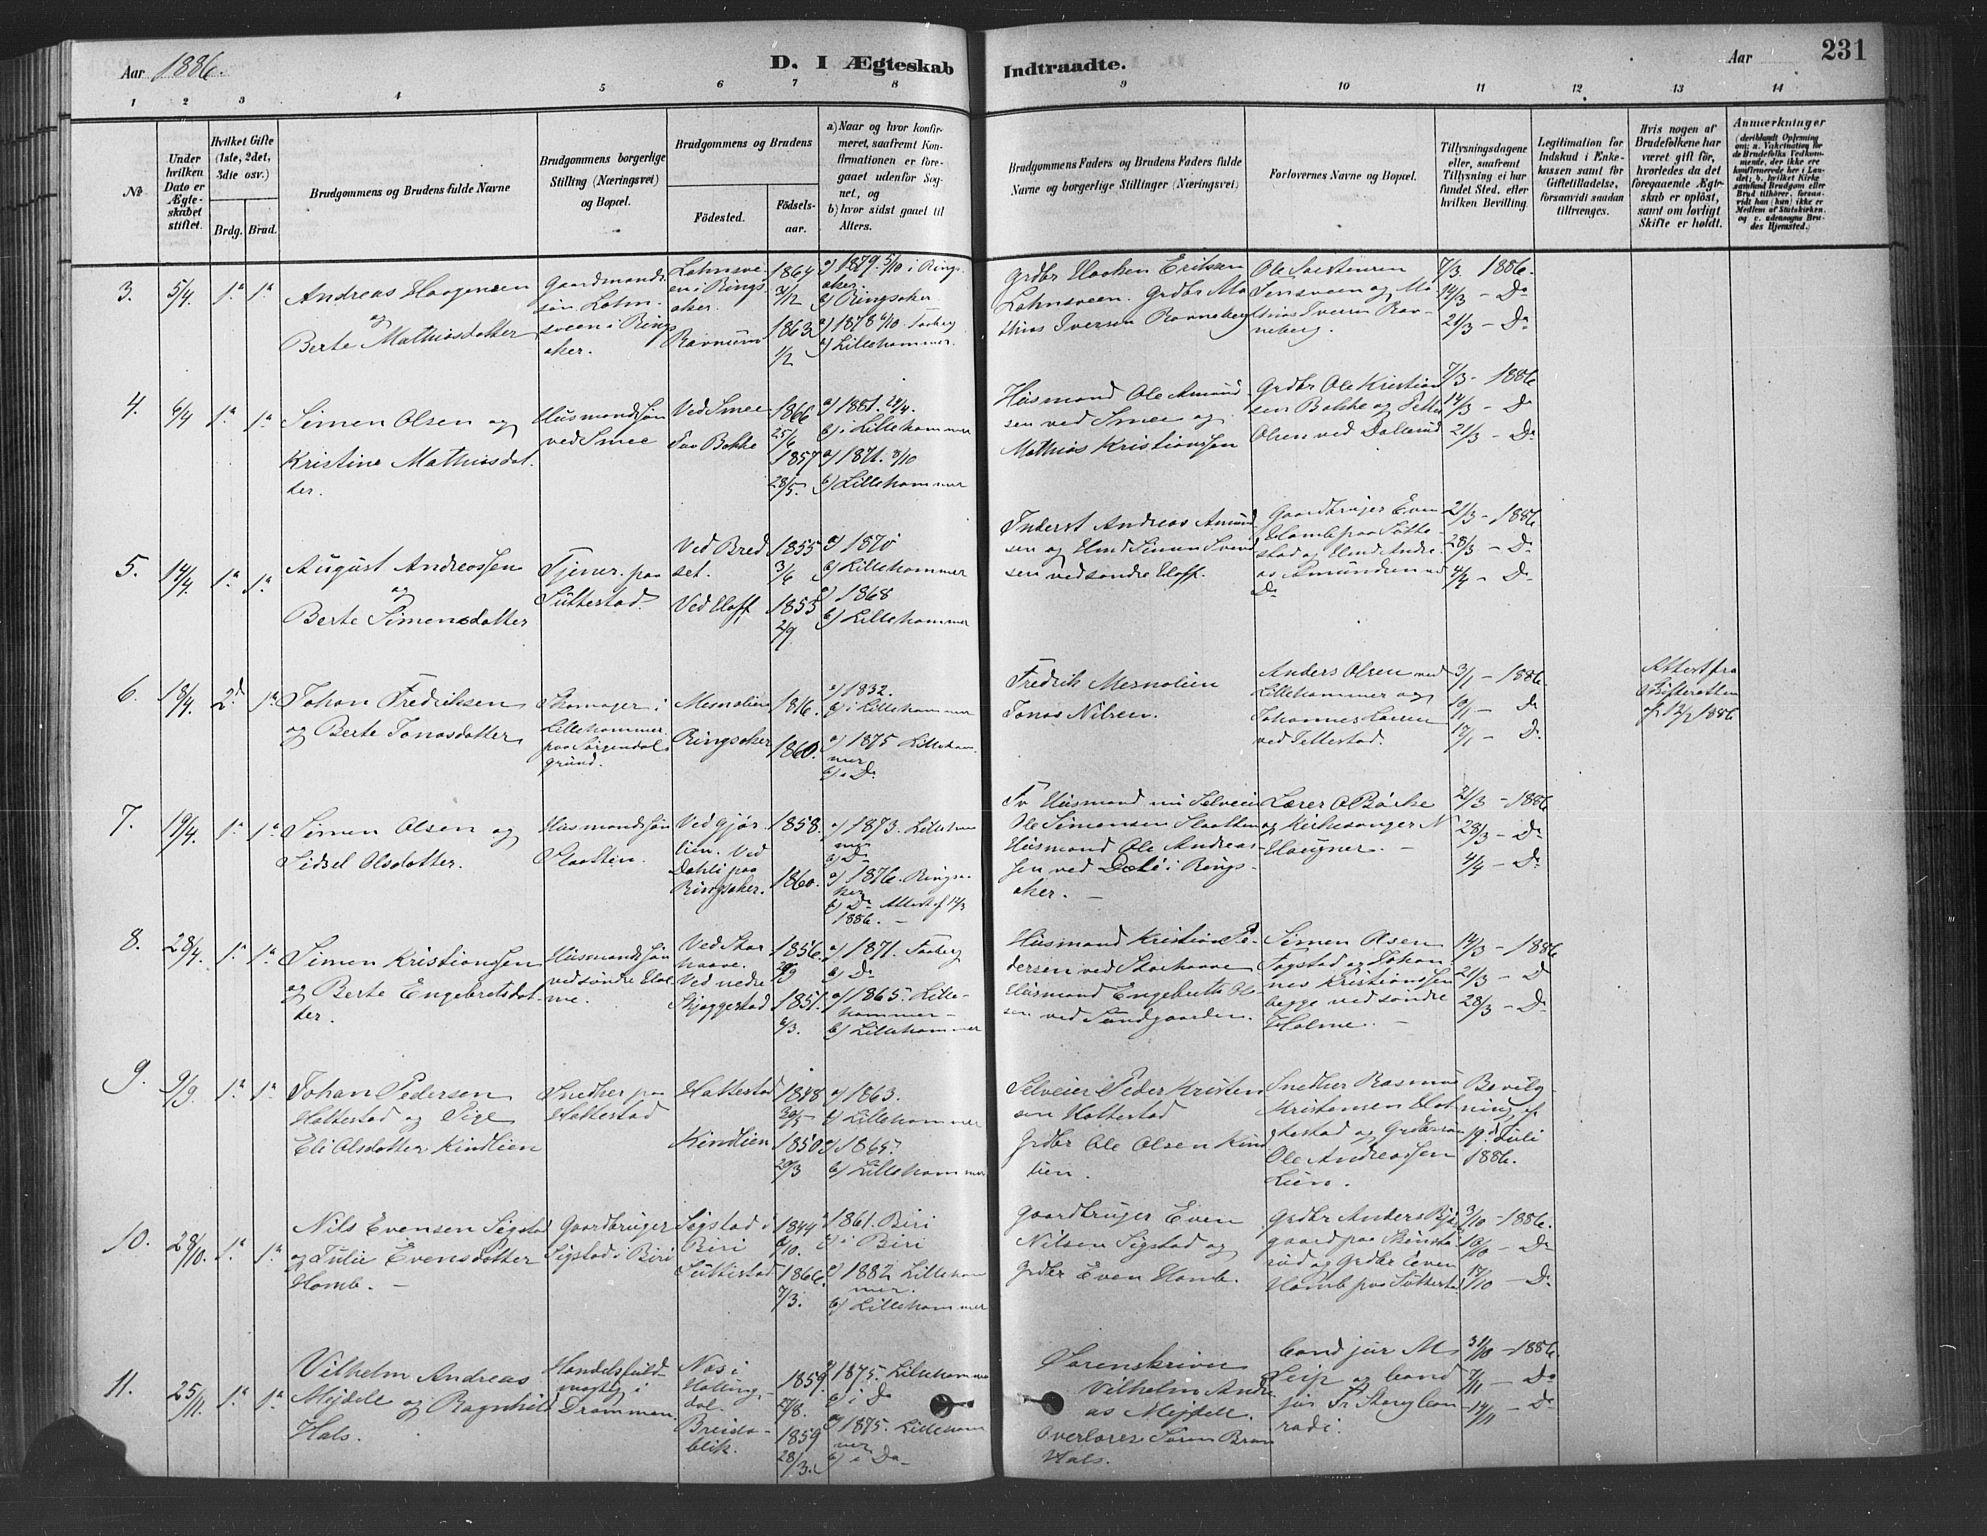 SAH, Fåberg prestekontor, Ministerialbok nr. 9, 1879-1898, s. 231